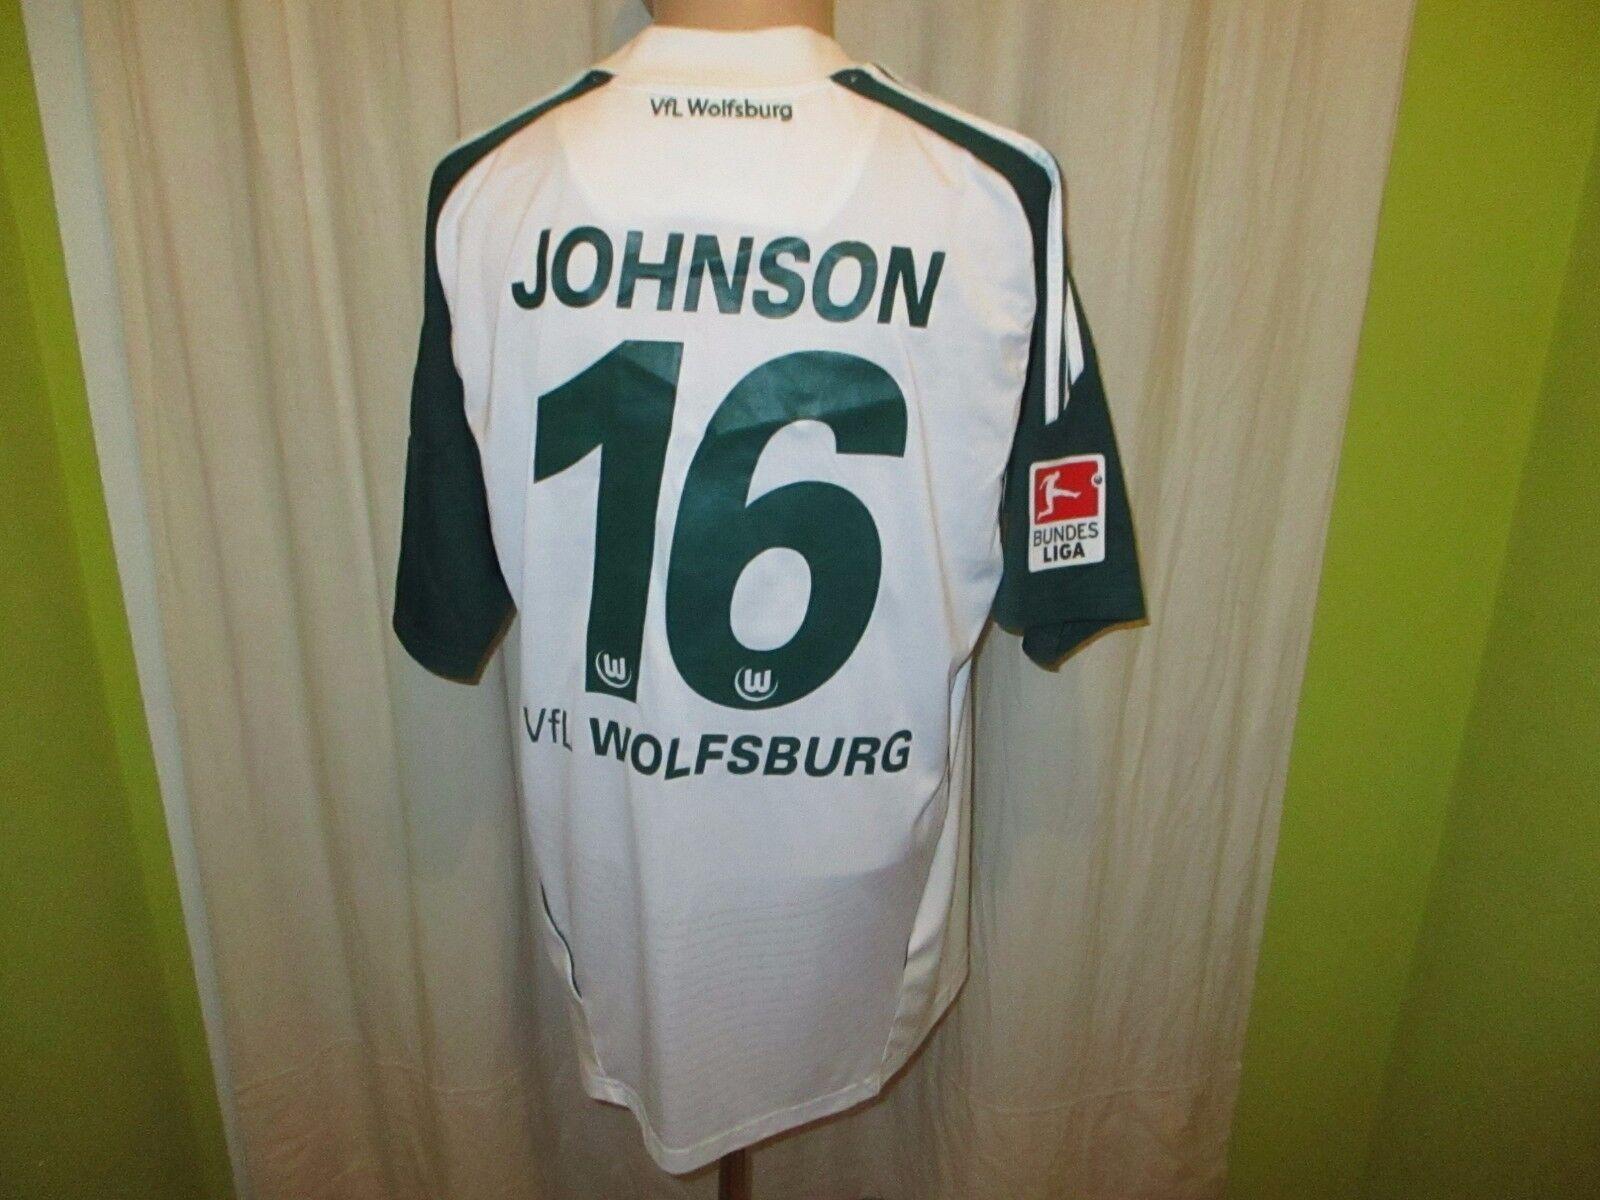 VfL Wolfsburg Original Adidas Adidas Adidas Heim Trikot 2010 11  VW  + Nr.16 Johnson Gr.L TOP edf1c8